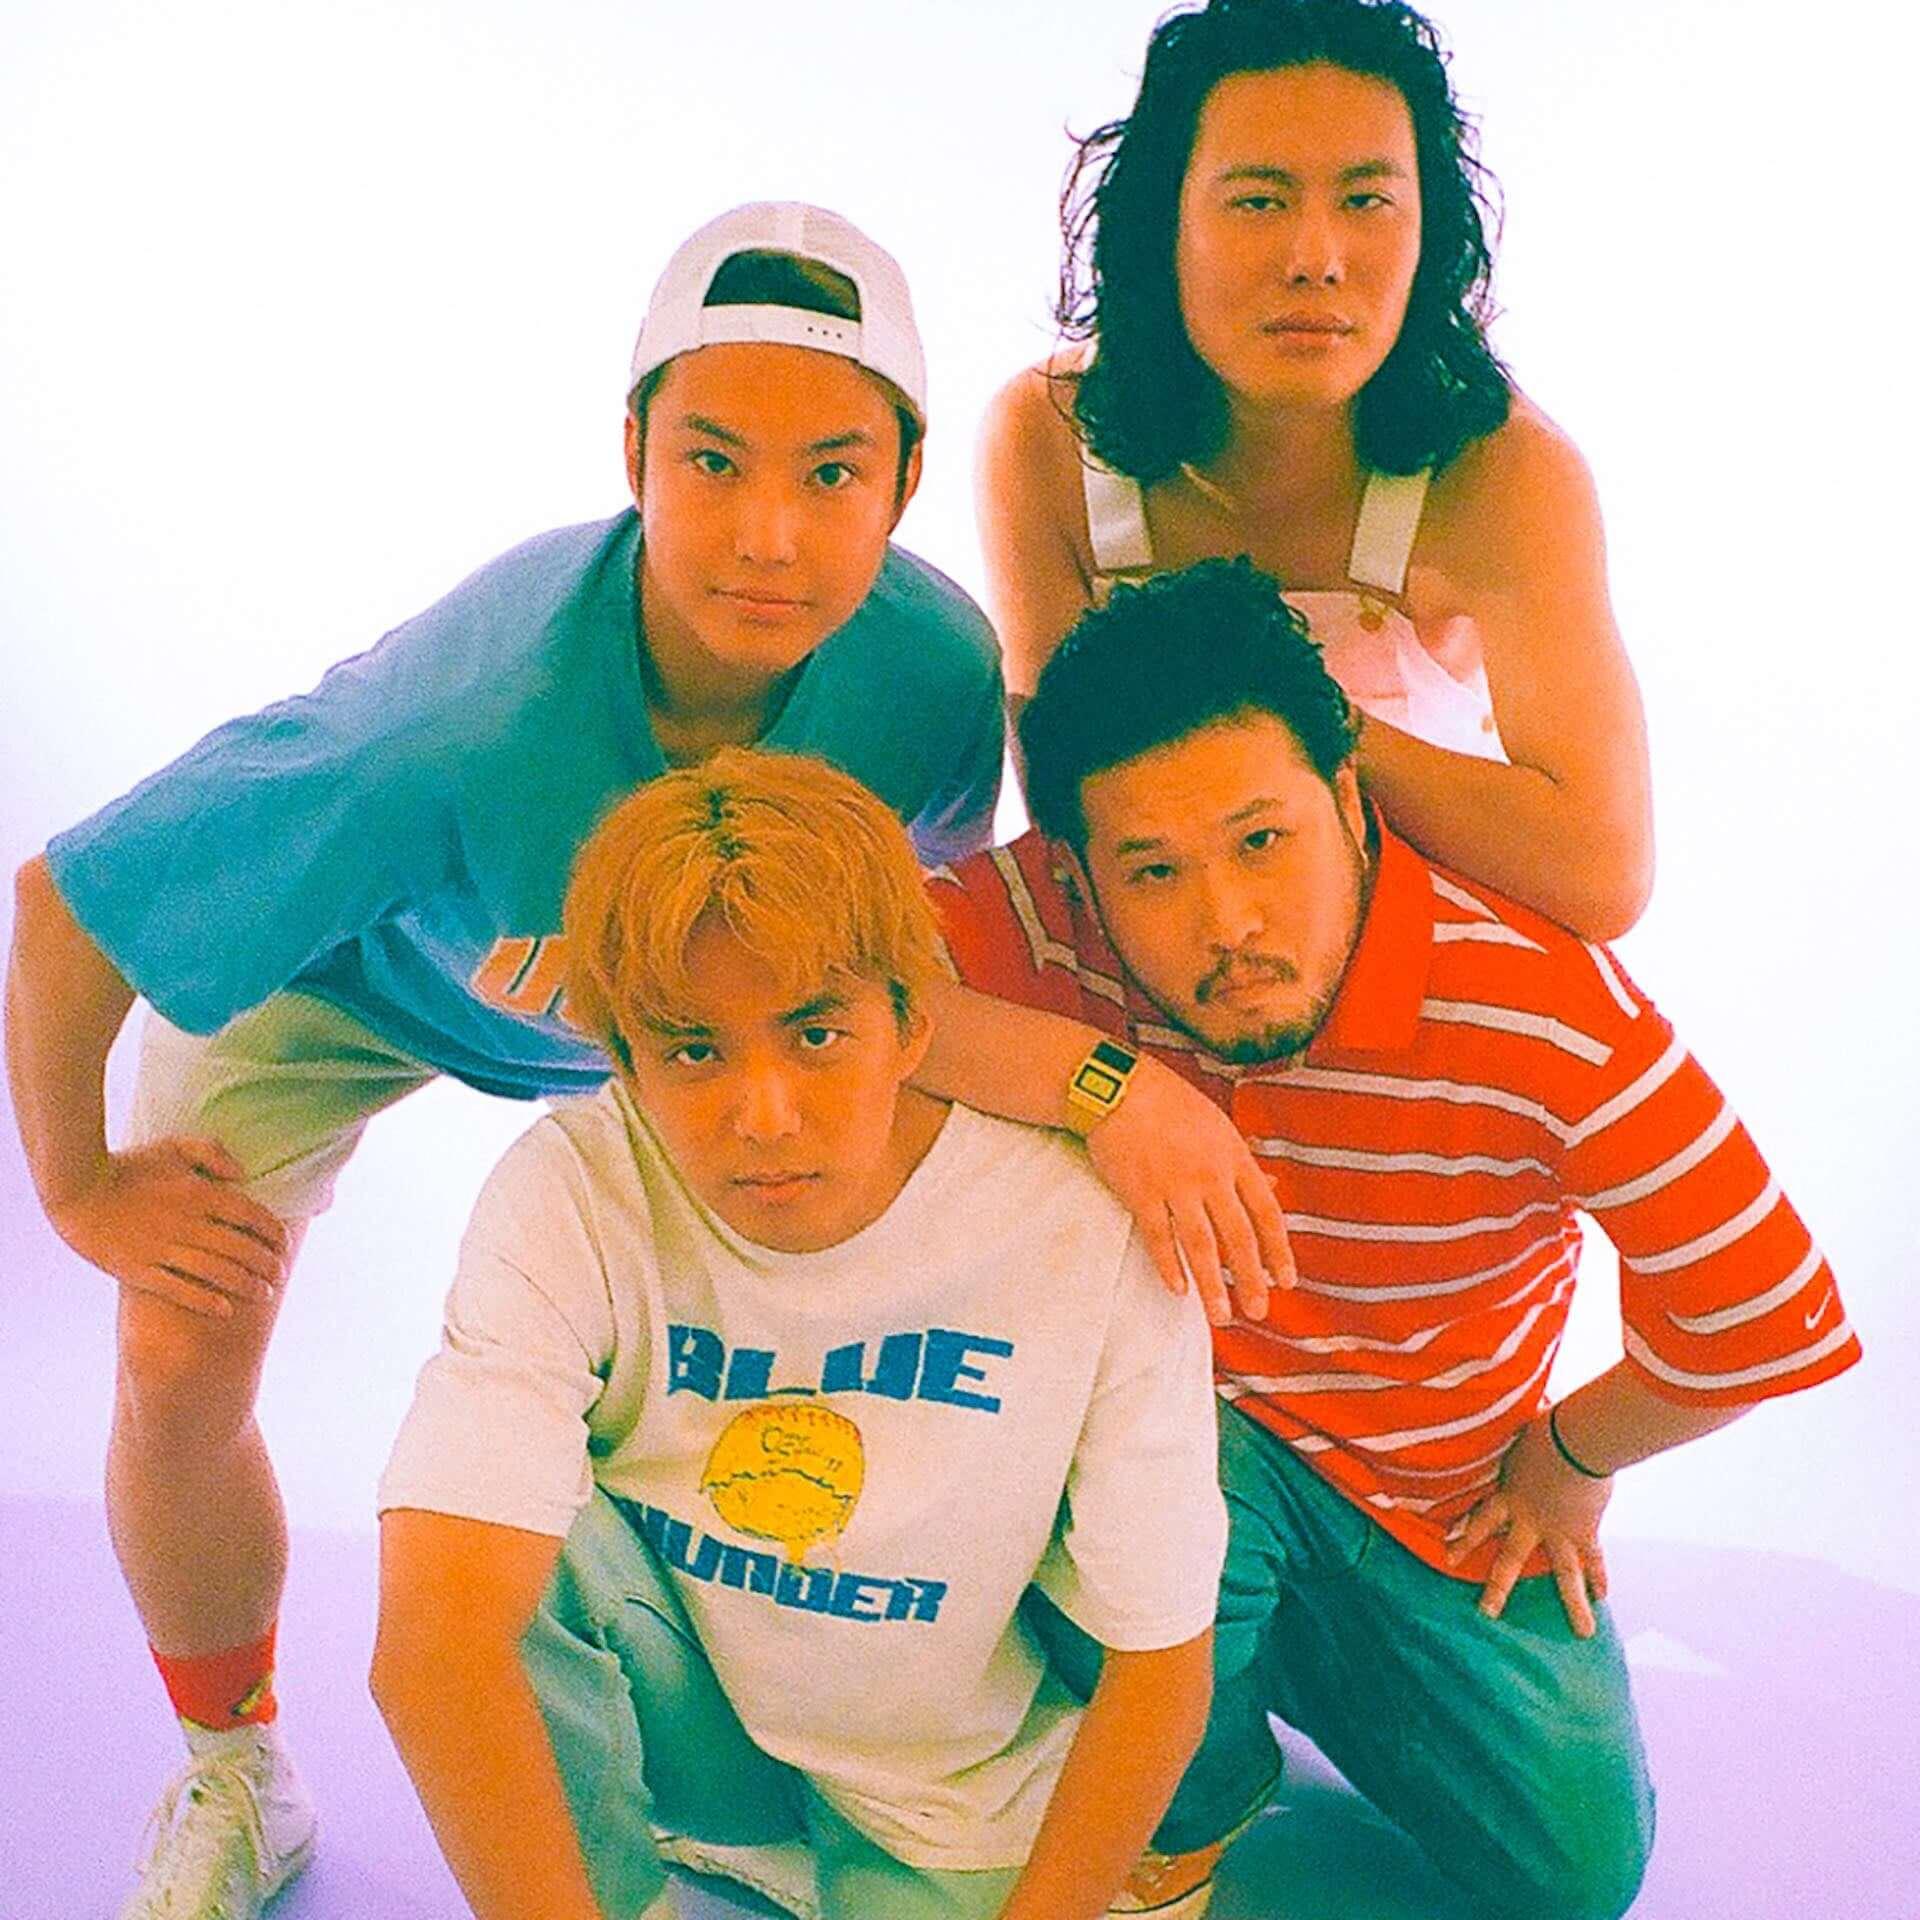 TENDOUJIが年内に新アルバム『MONSTER』と『Smoke!!』をリリース&全国ツアー実施決定!YouTube番組もスタート music210301_tendouji_6-1920x1920